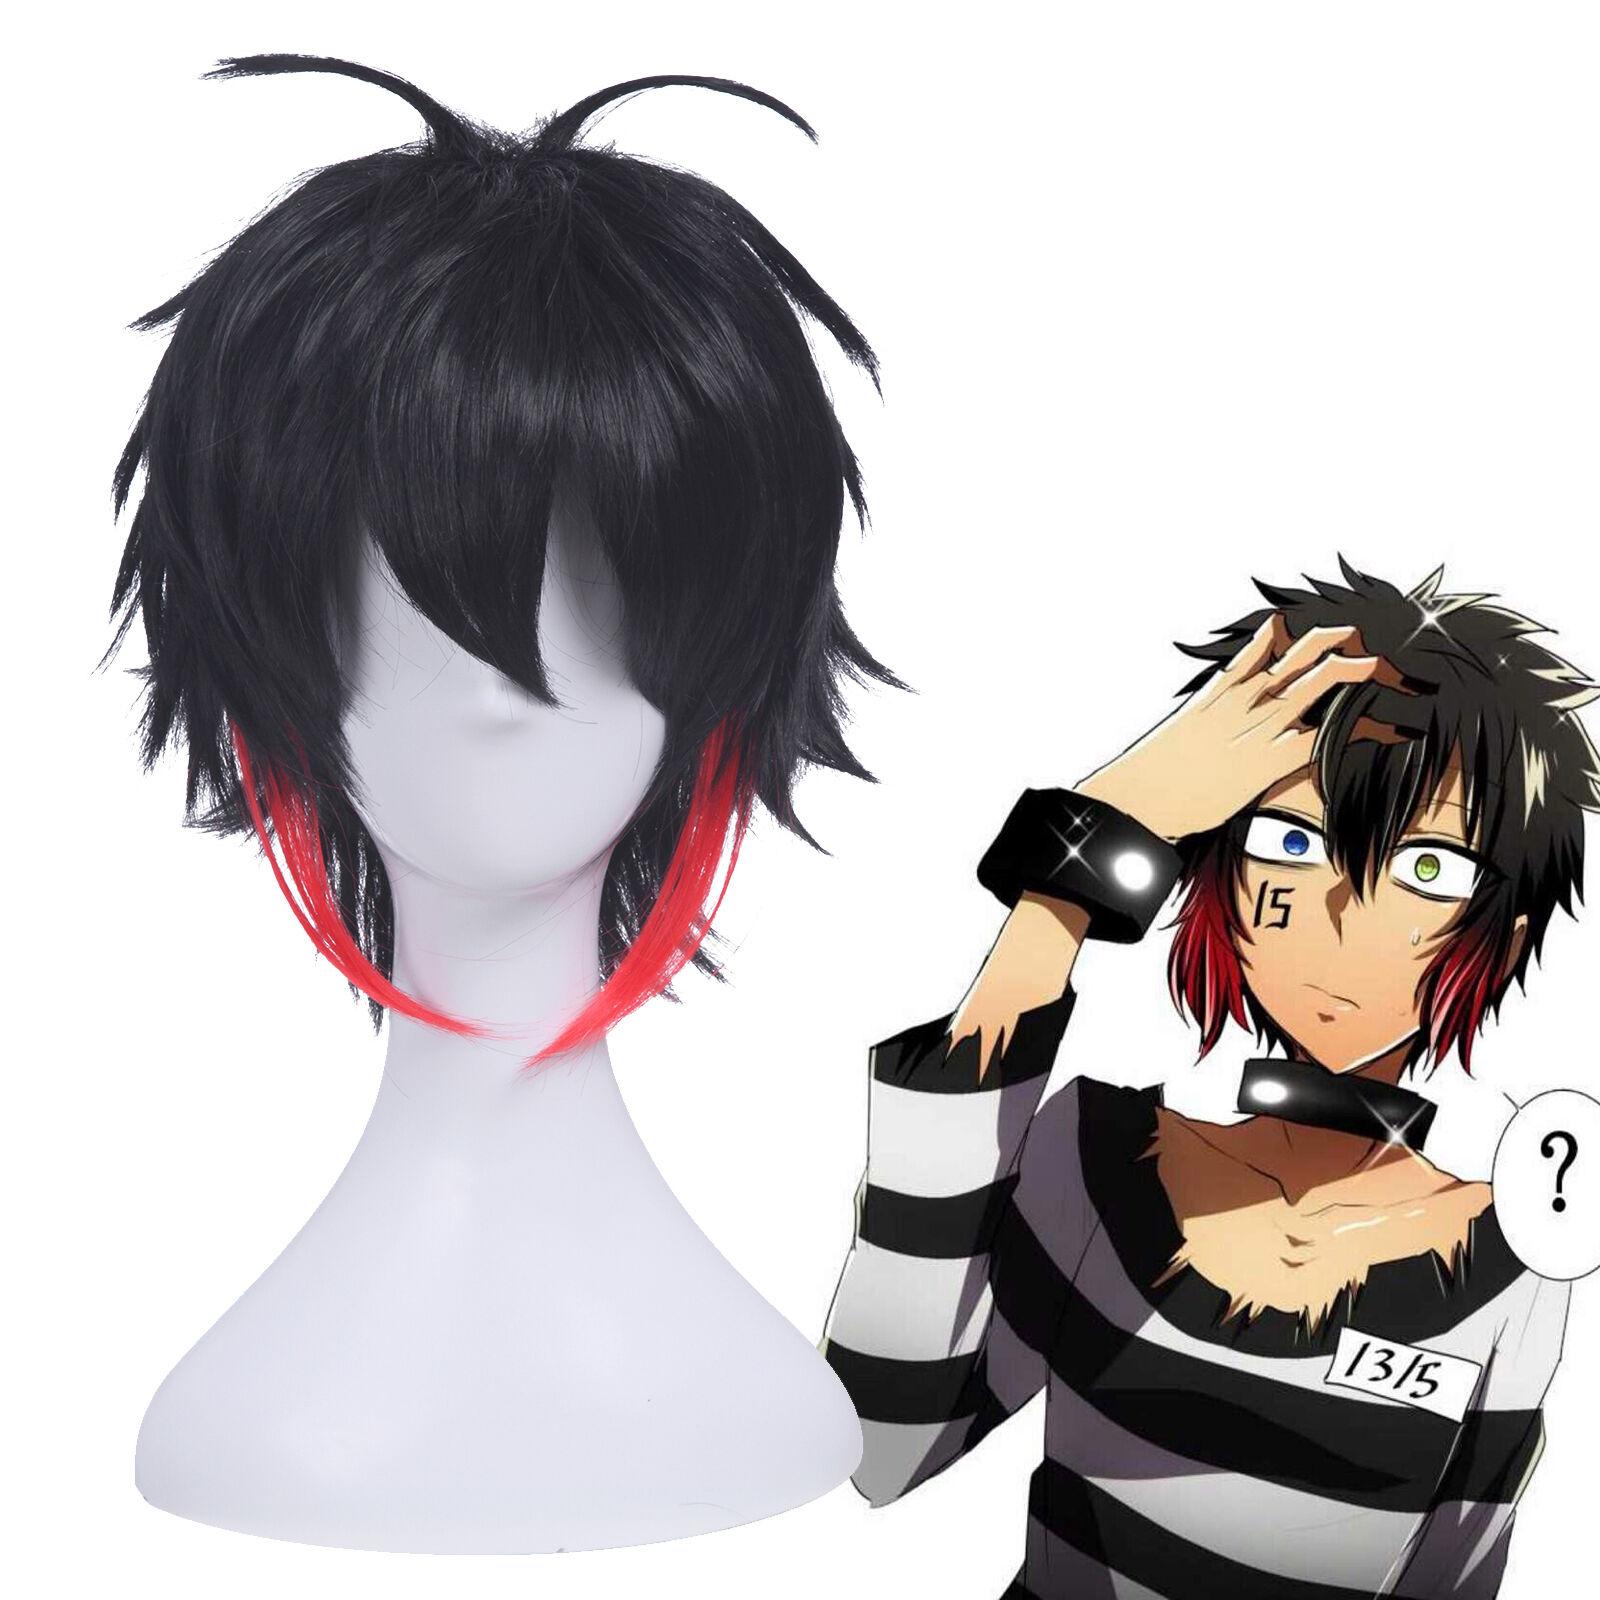 Cap Nanbaka Detentionhouse Jyugo No 15 Anime Costume Cosplay Wig Track Number